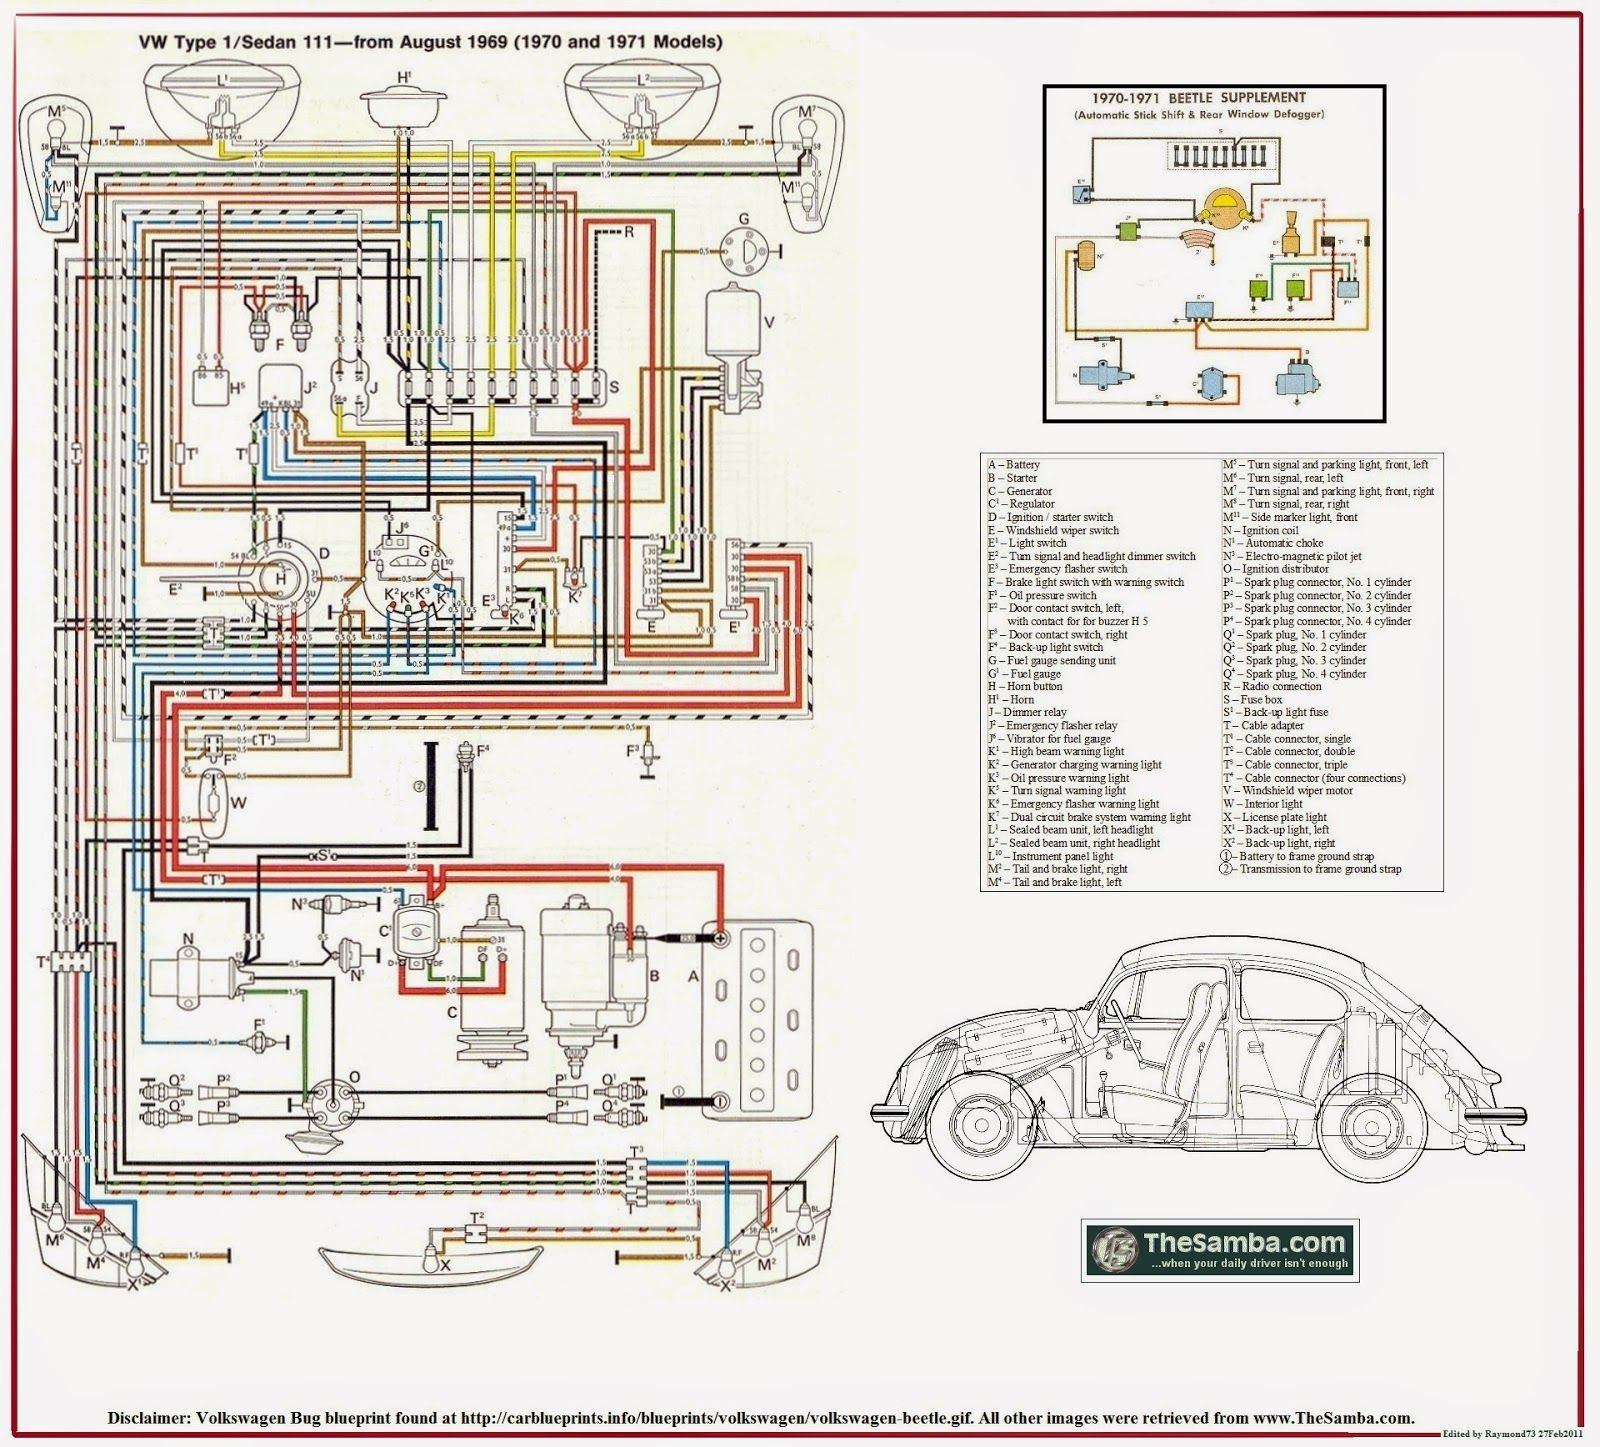 Vw Dune Buggy Wiring Harness Expert Schematics Diagram Bad Boy Ambush Bug For Schematic Diagrams Golf Cart